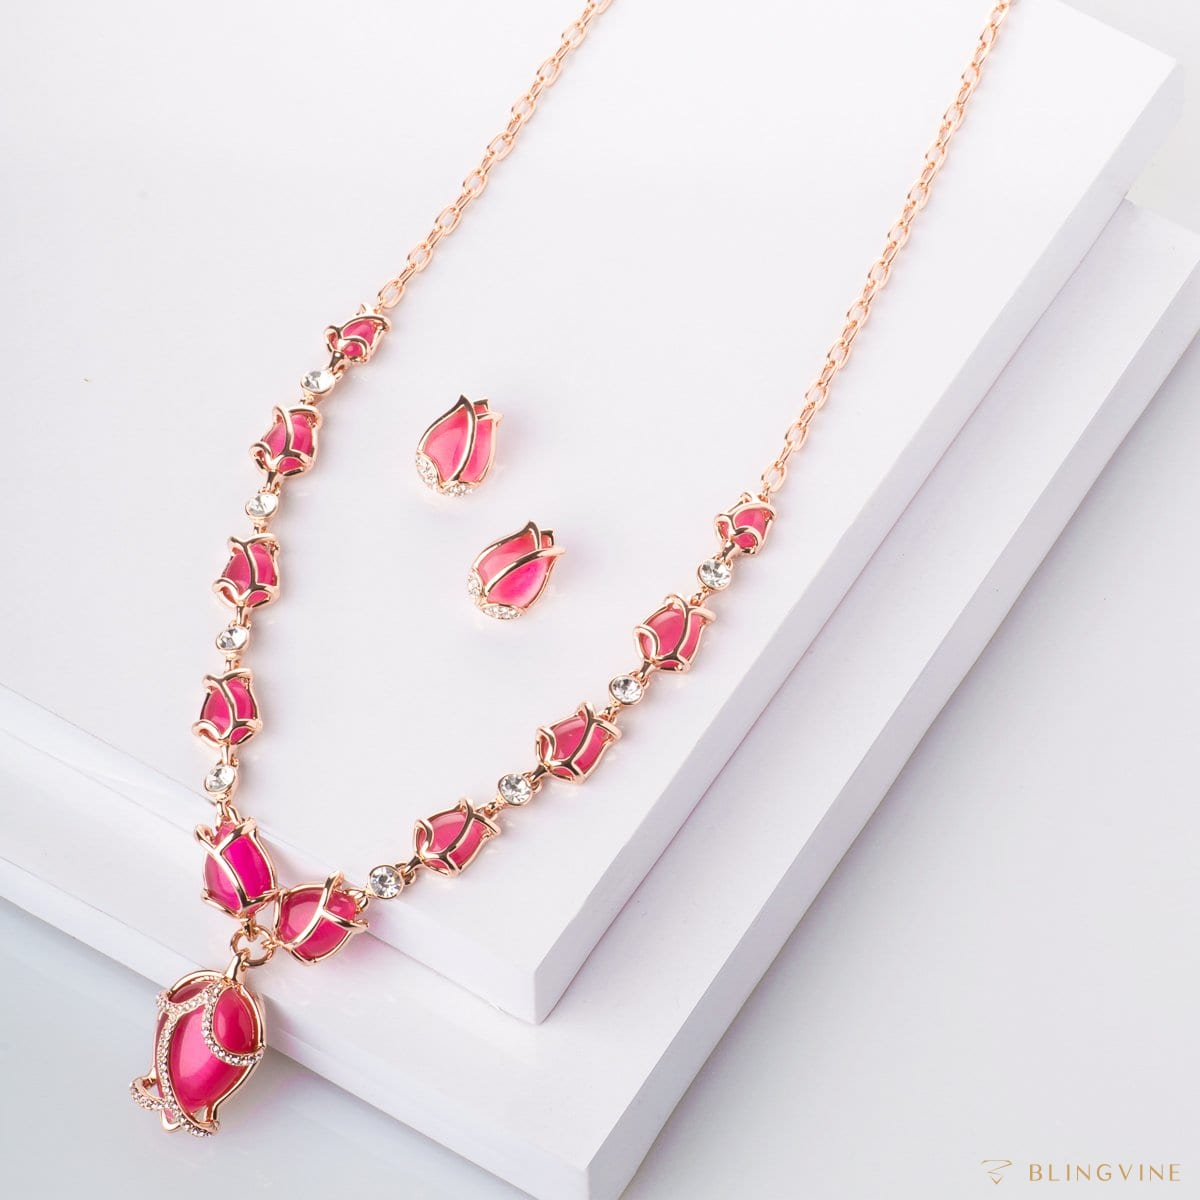 Tulips Long Necklace Set Pink Blingvine